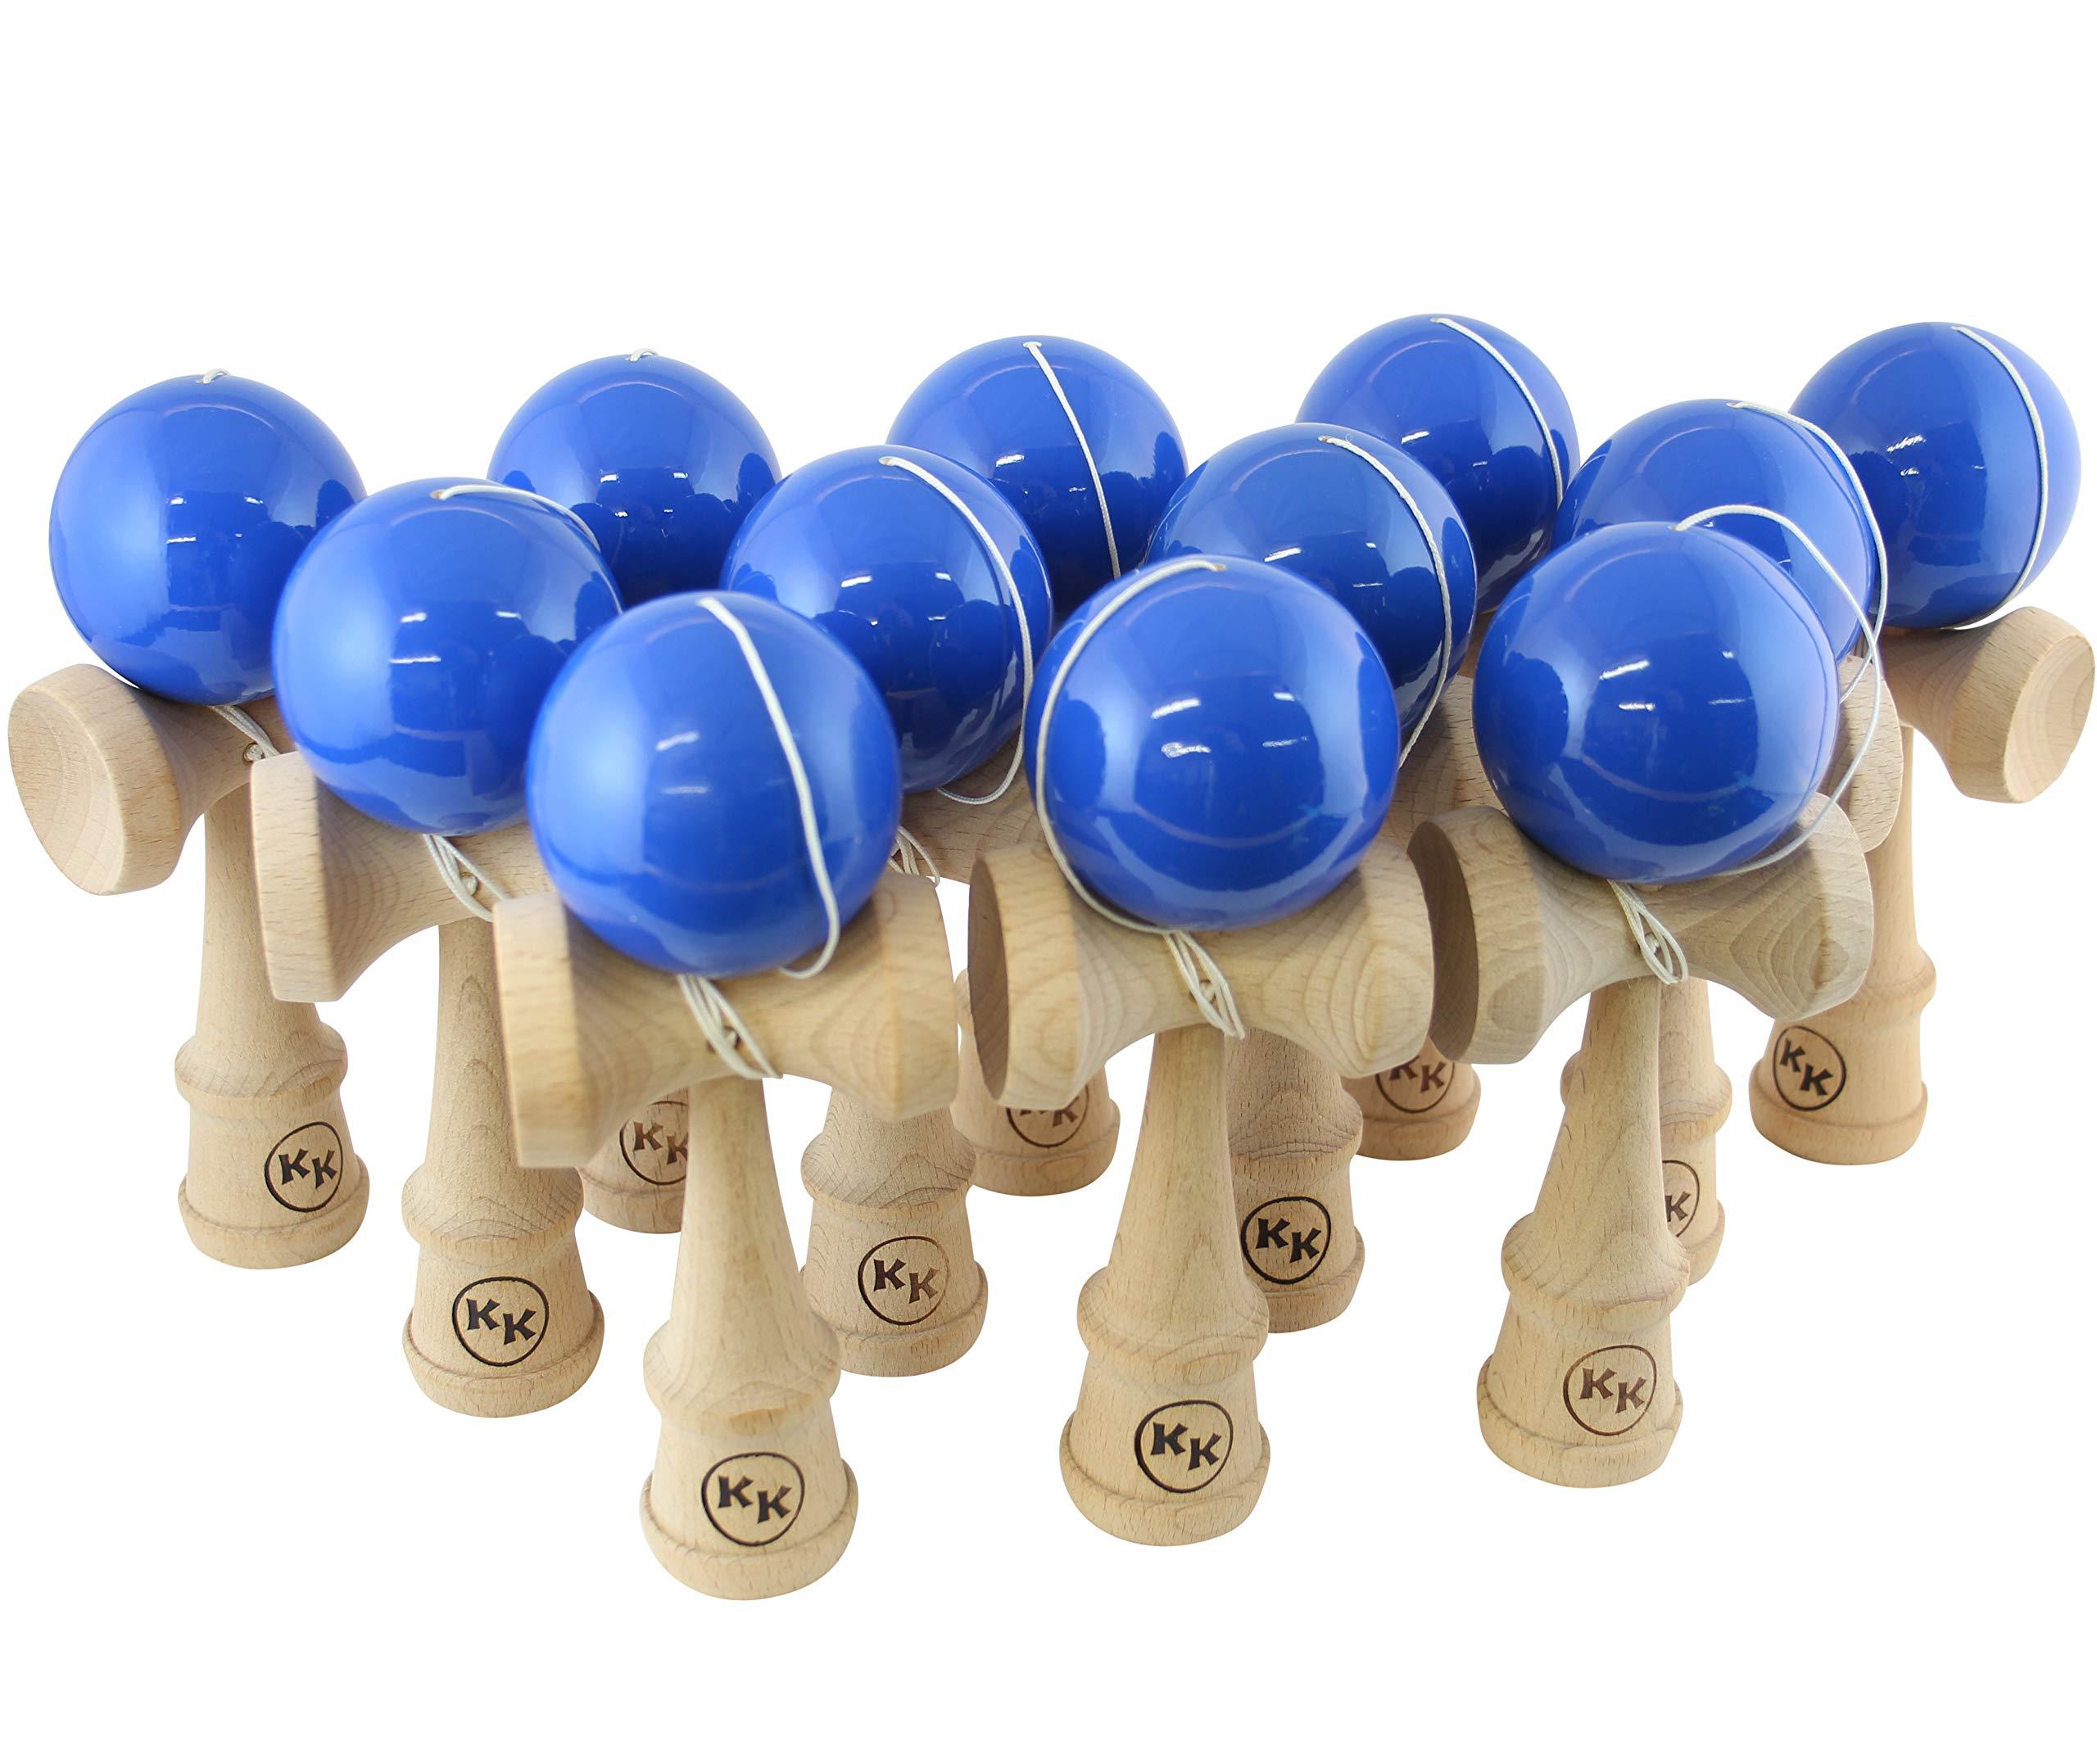 Kotaro Pro Wood Kendama 12 Pack of Bulk Kendamas (Blue)